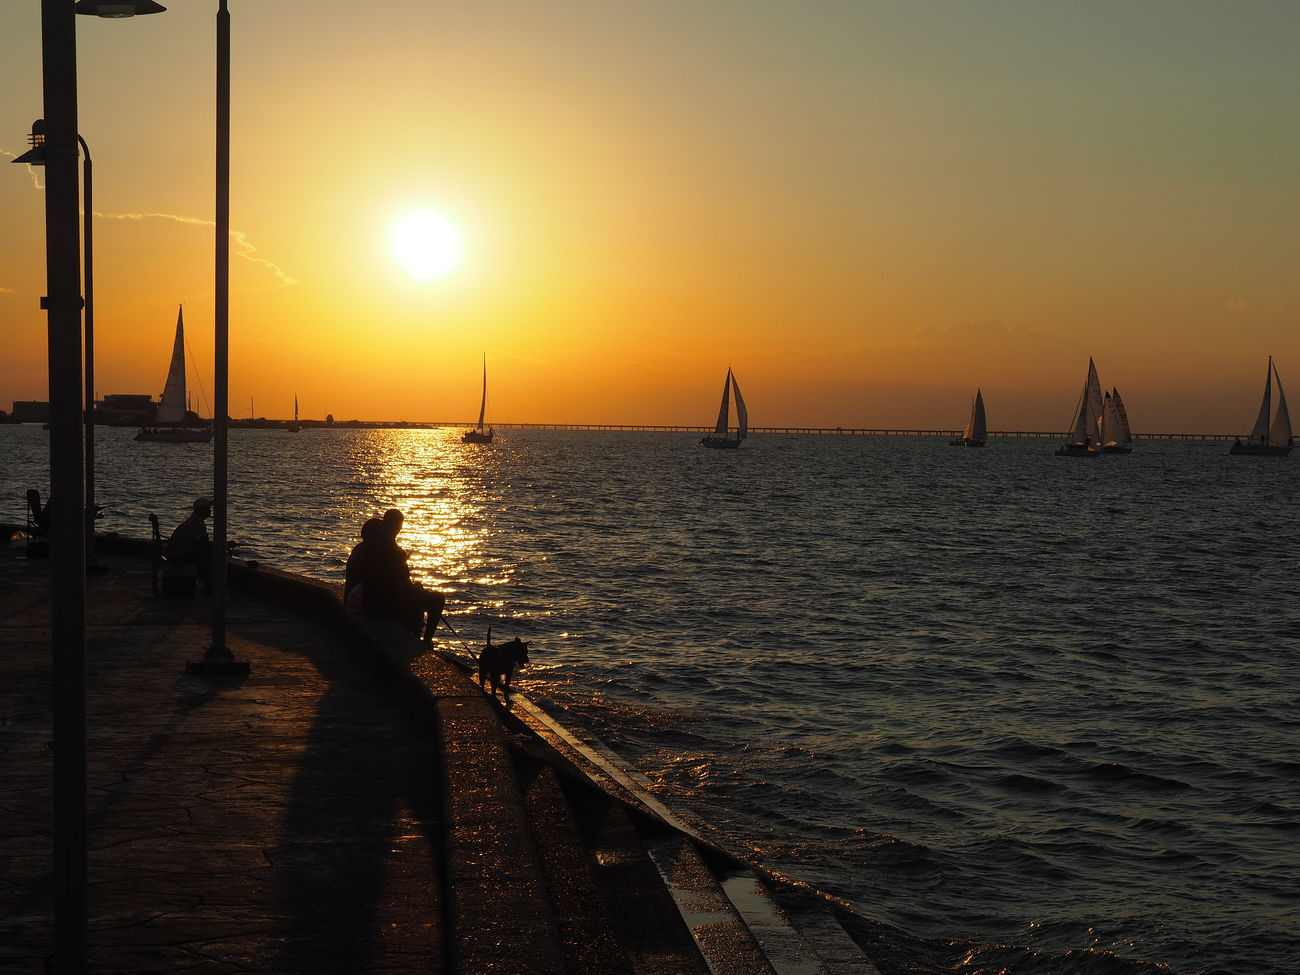 Lakeshore, New Orleans Lakeshore Nautical Vessel Orange Outdoors Sailboats Scenics Sea Silhouette Sunset Warm Water